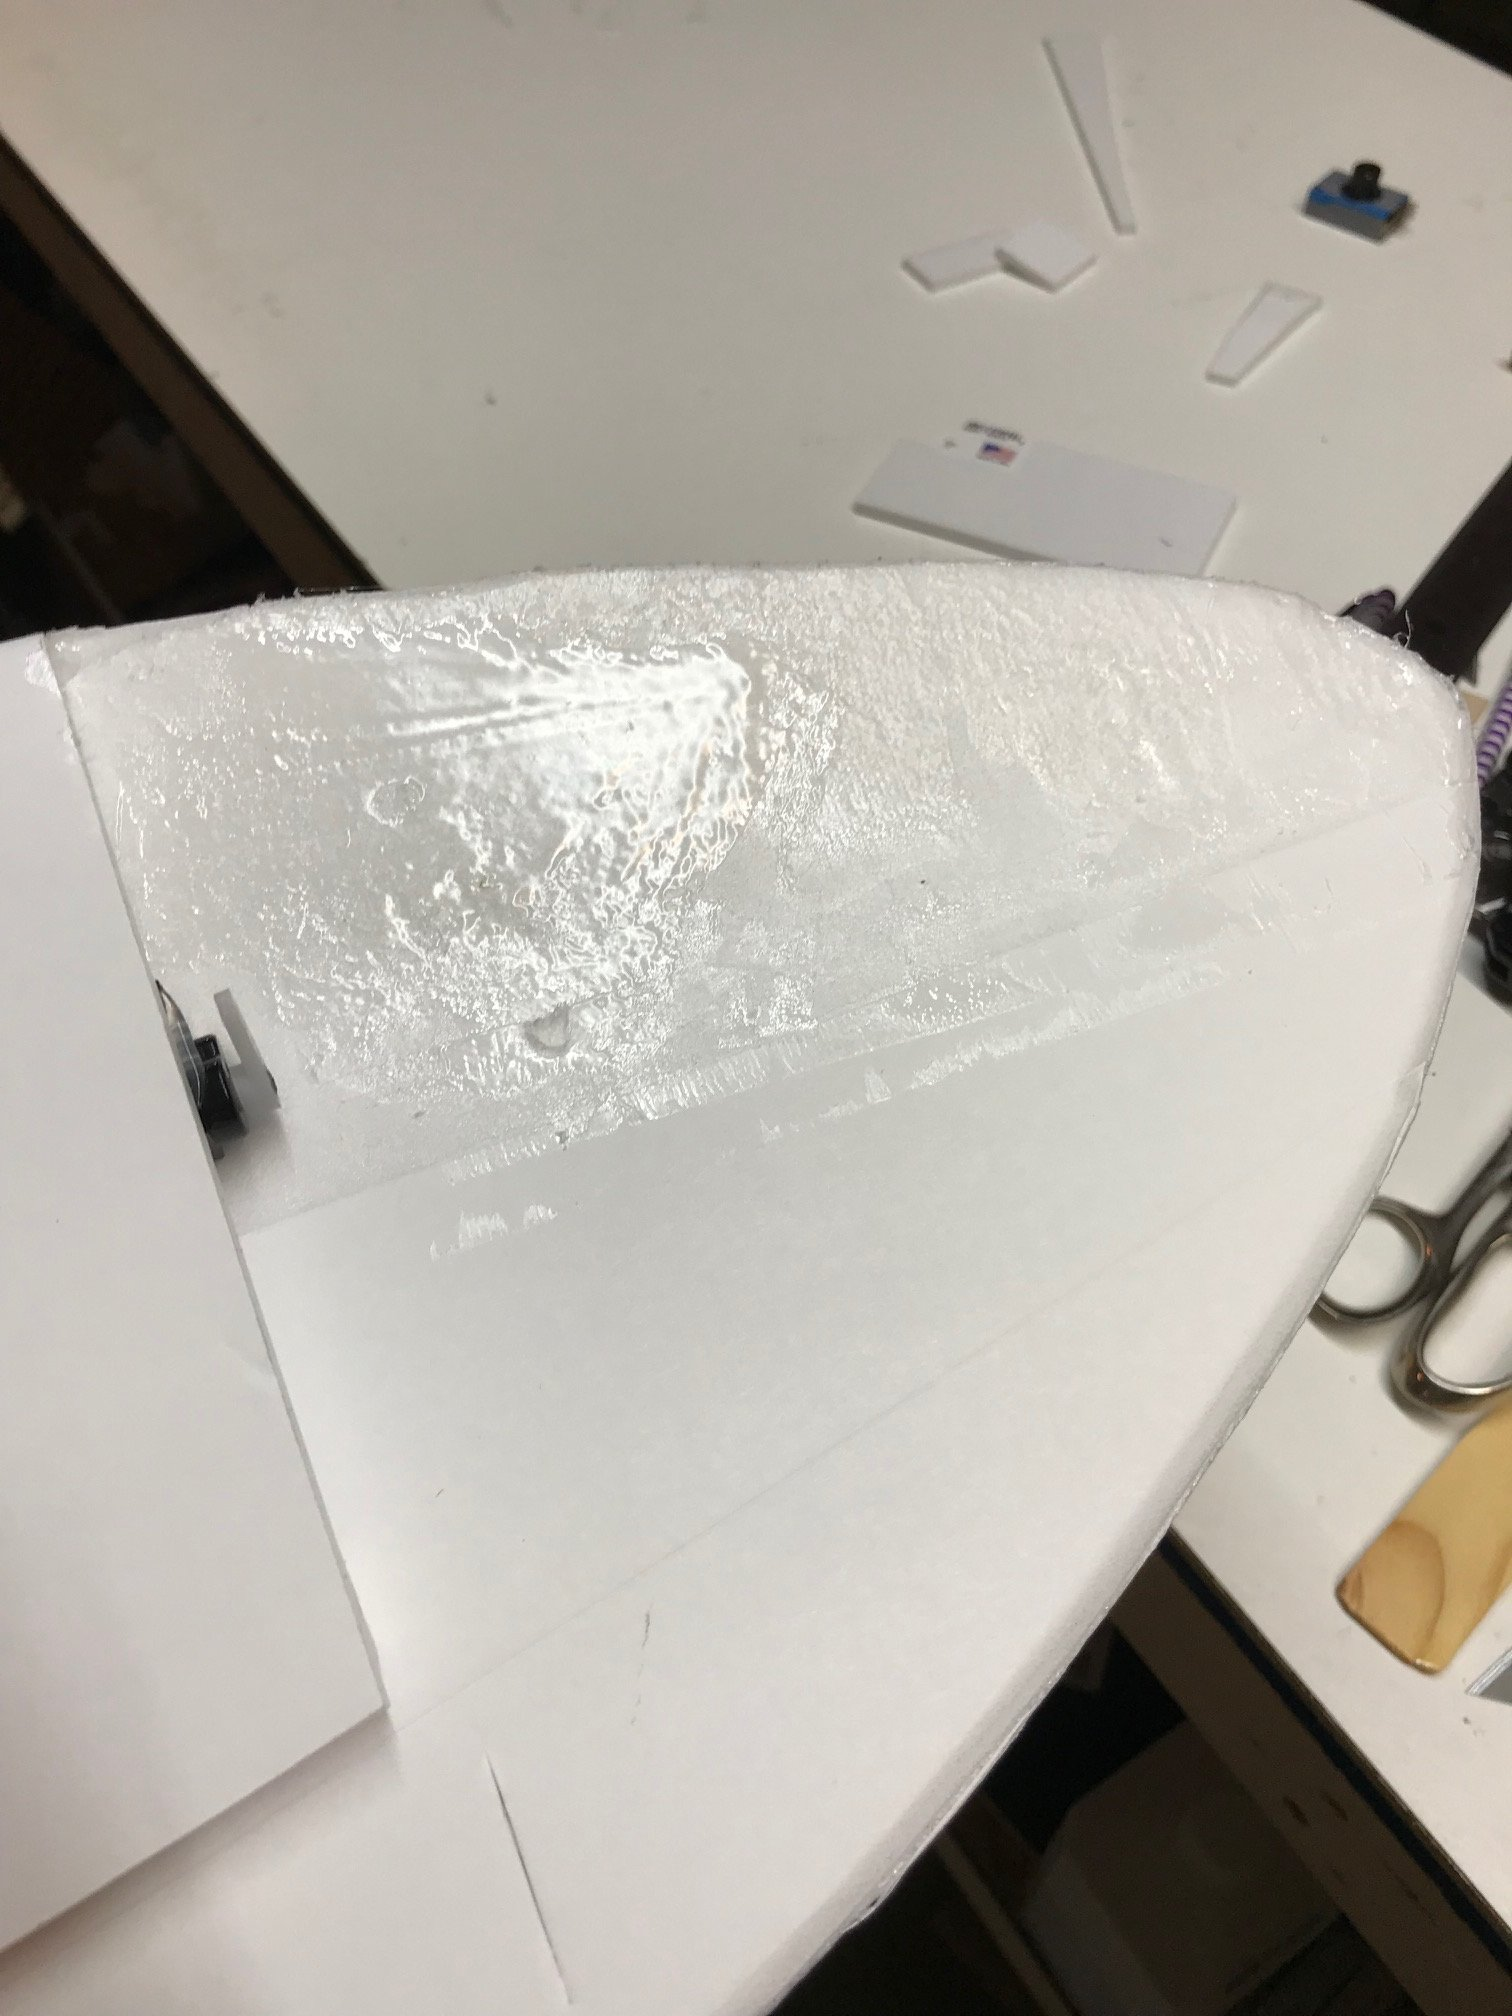 glue reinforce.jpg